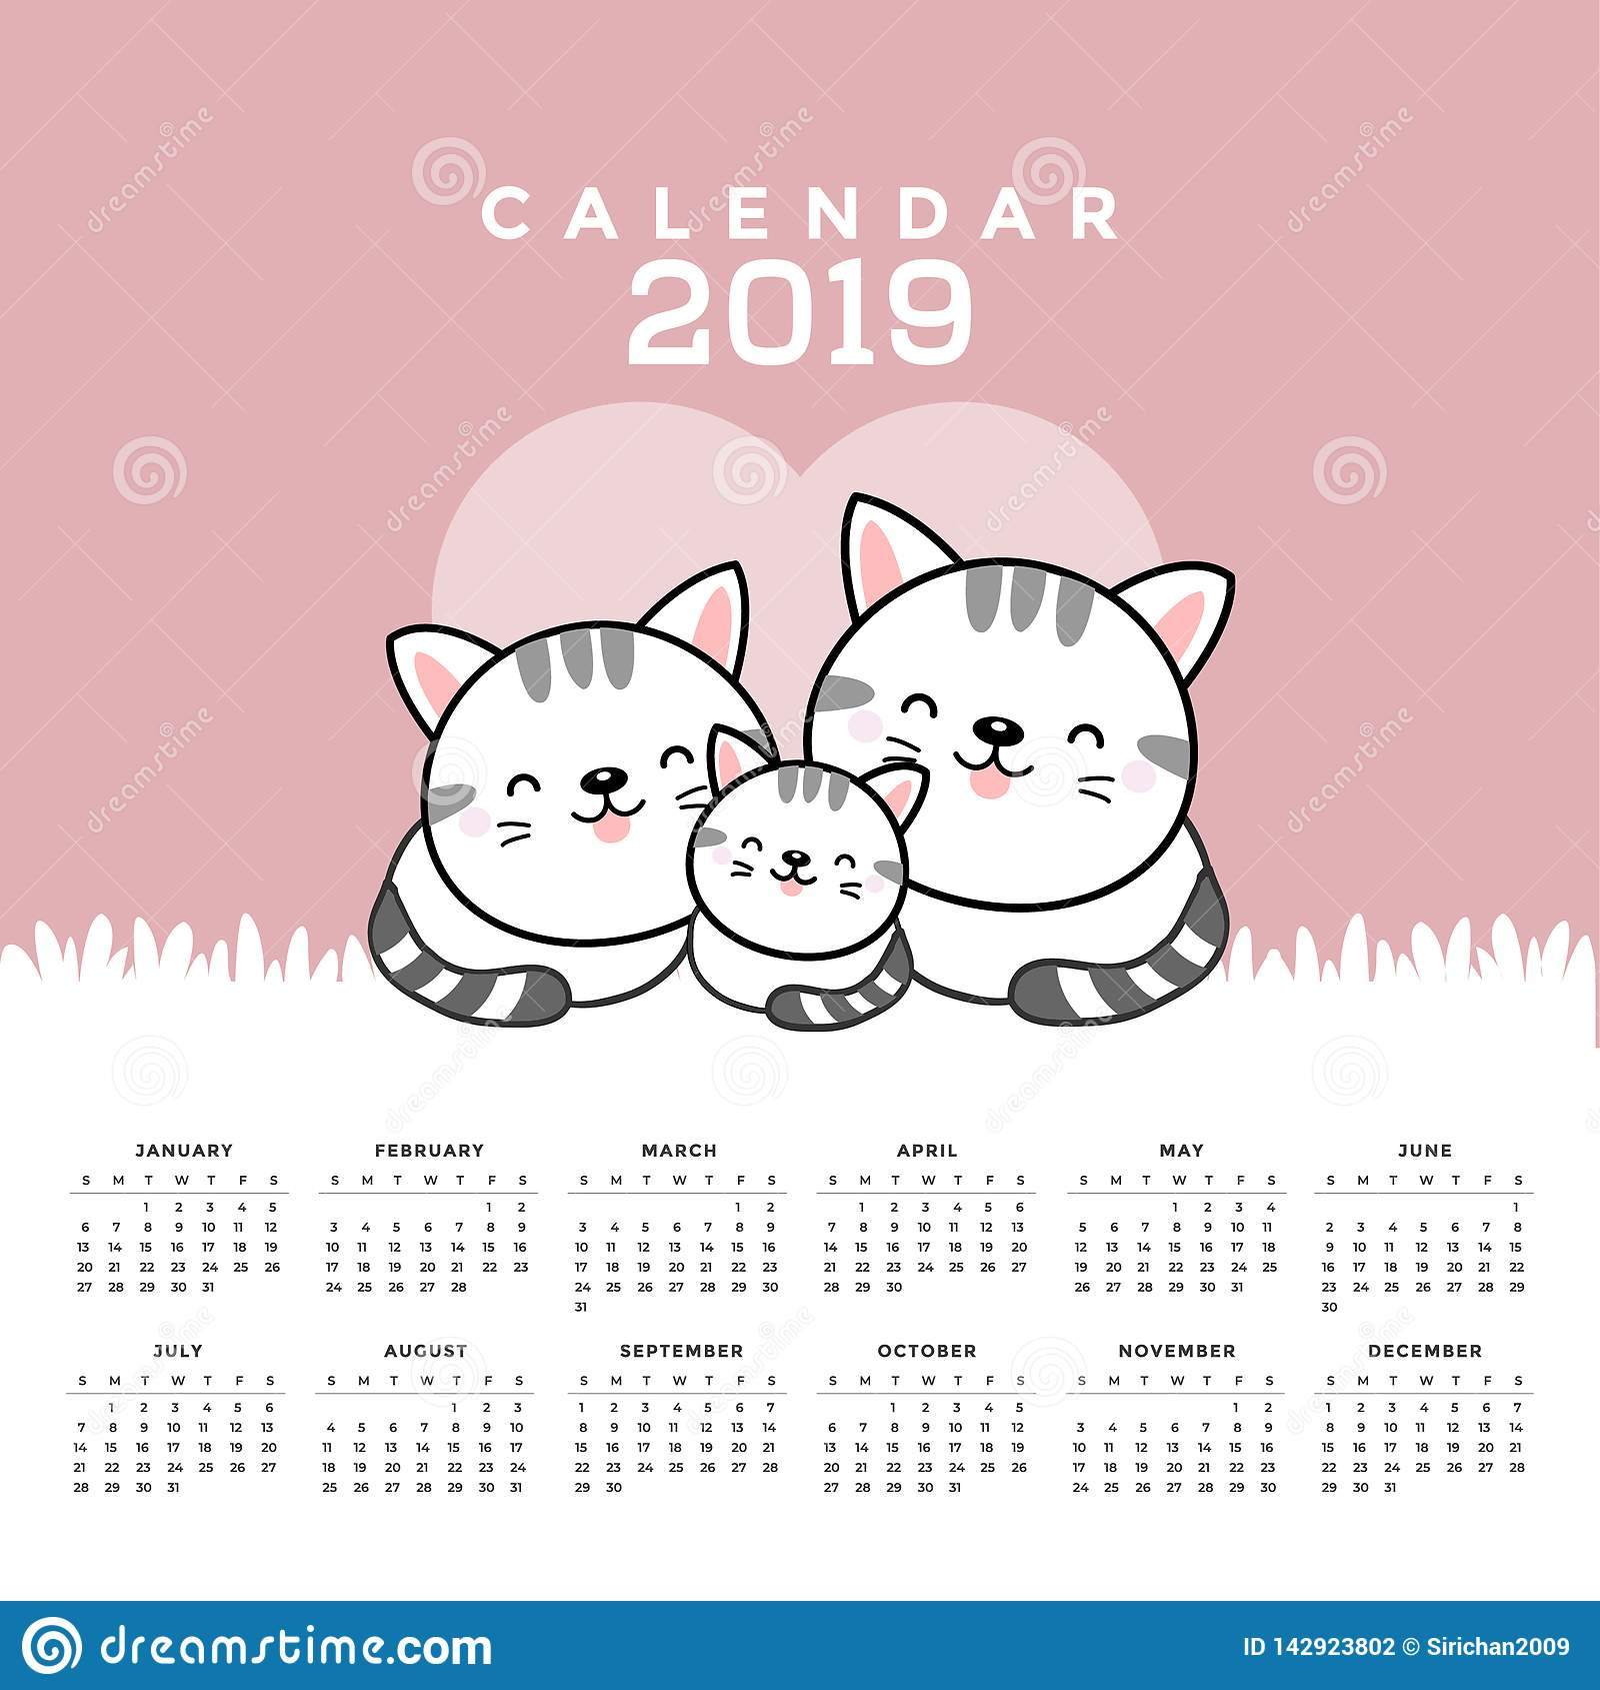 Calendrier 2019 avec les chats mignons